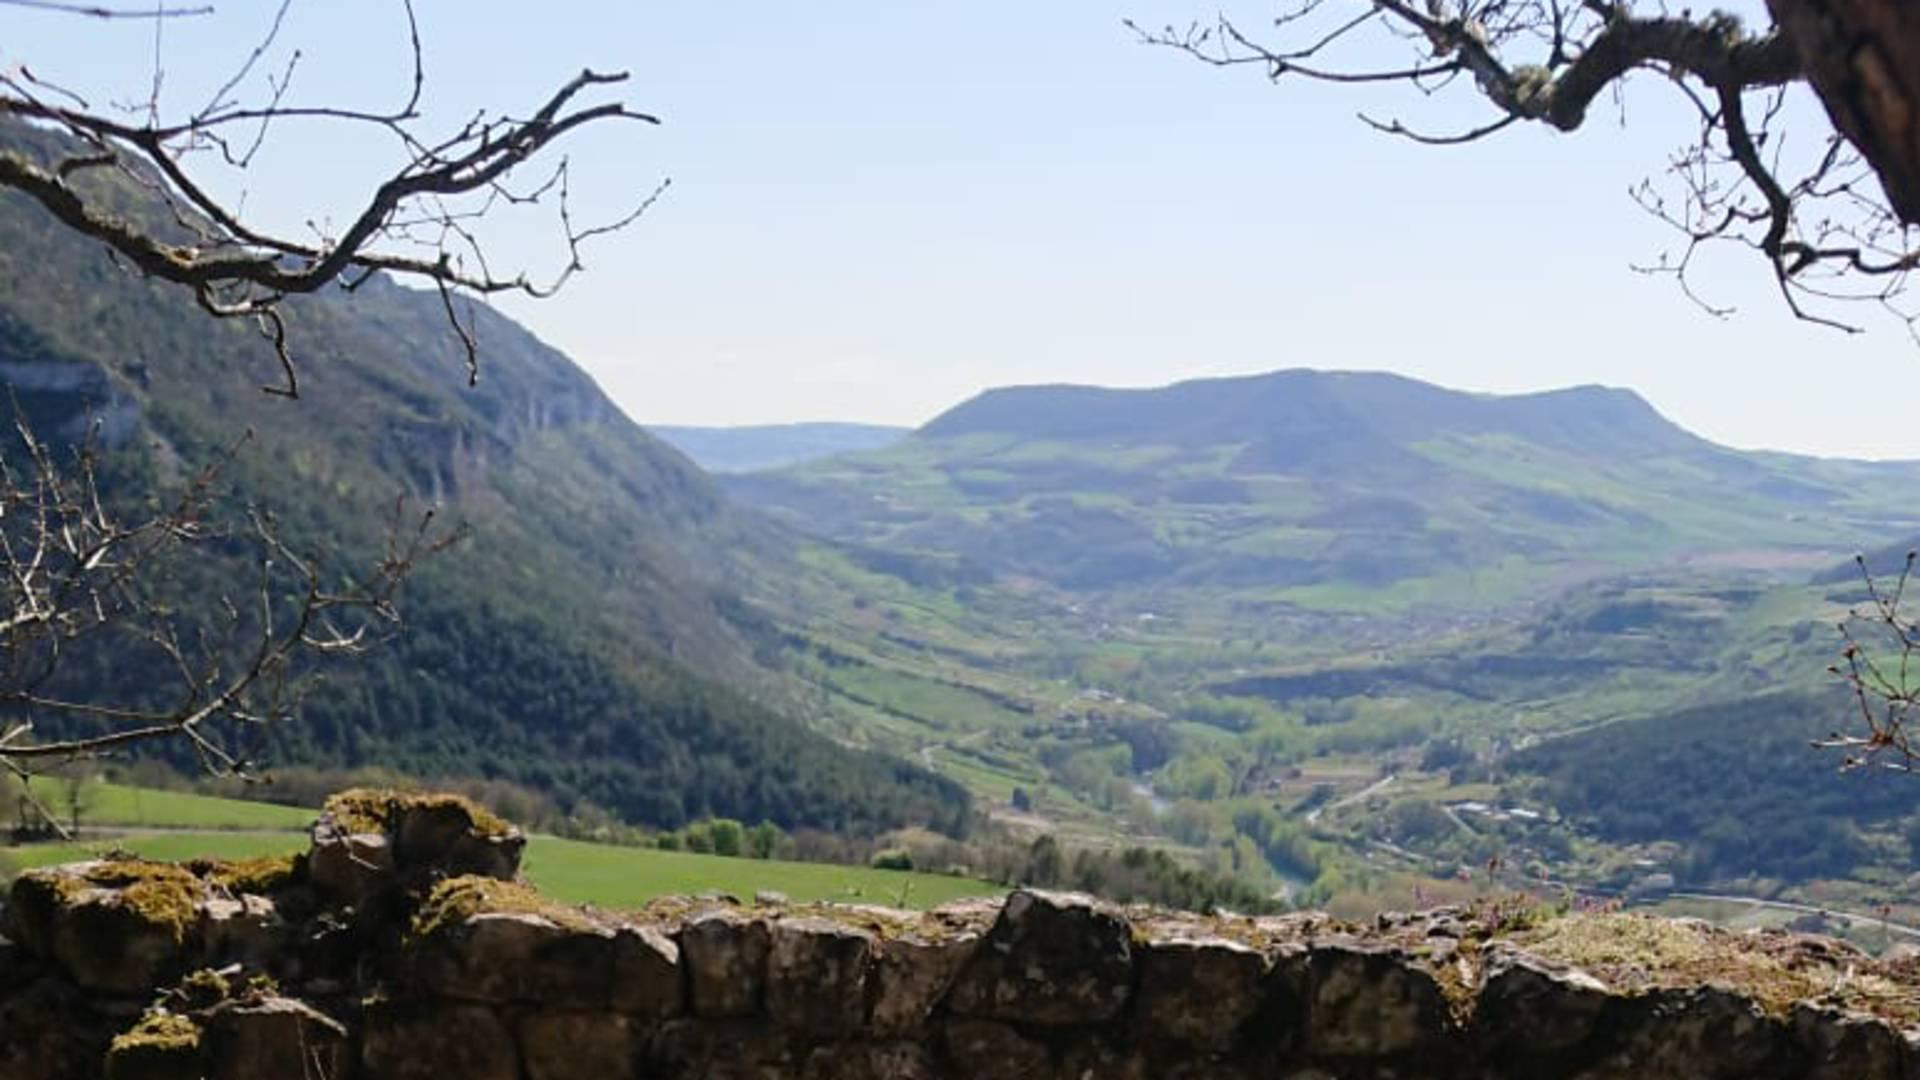 Vallée des respirs en Aveyron